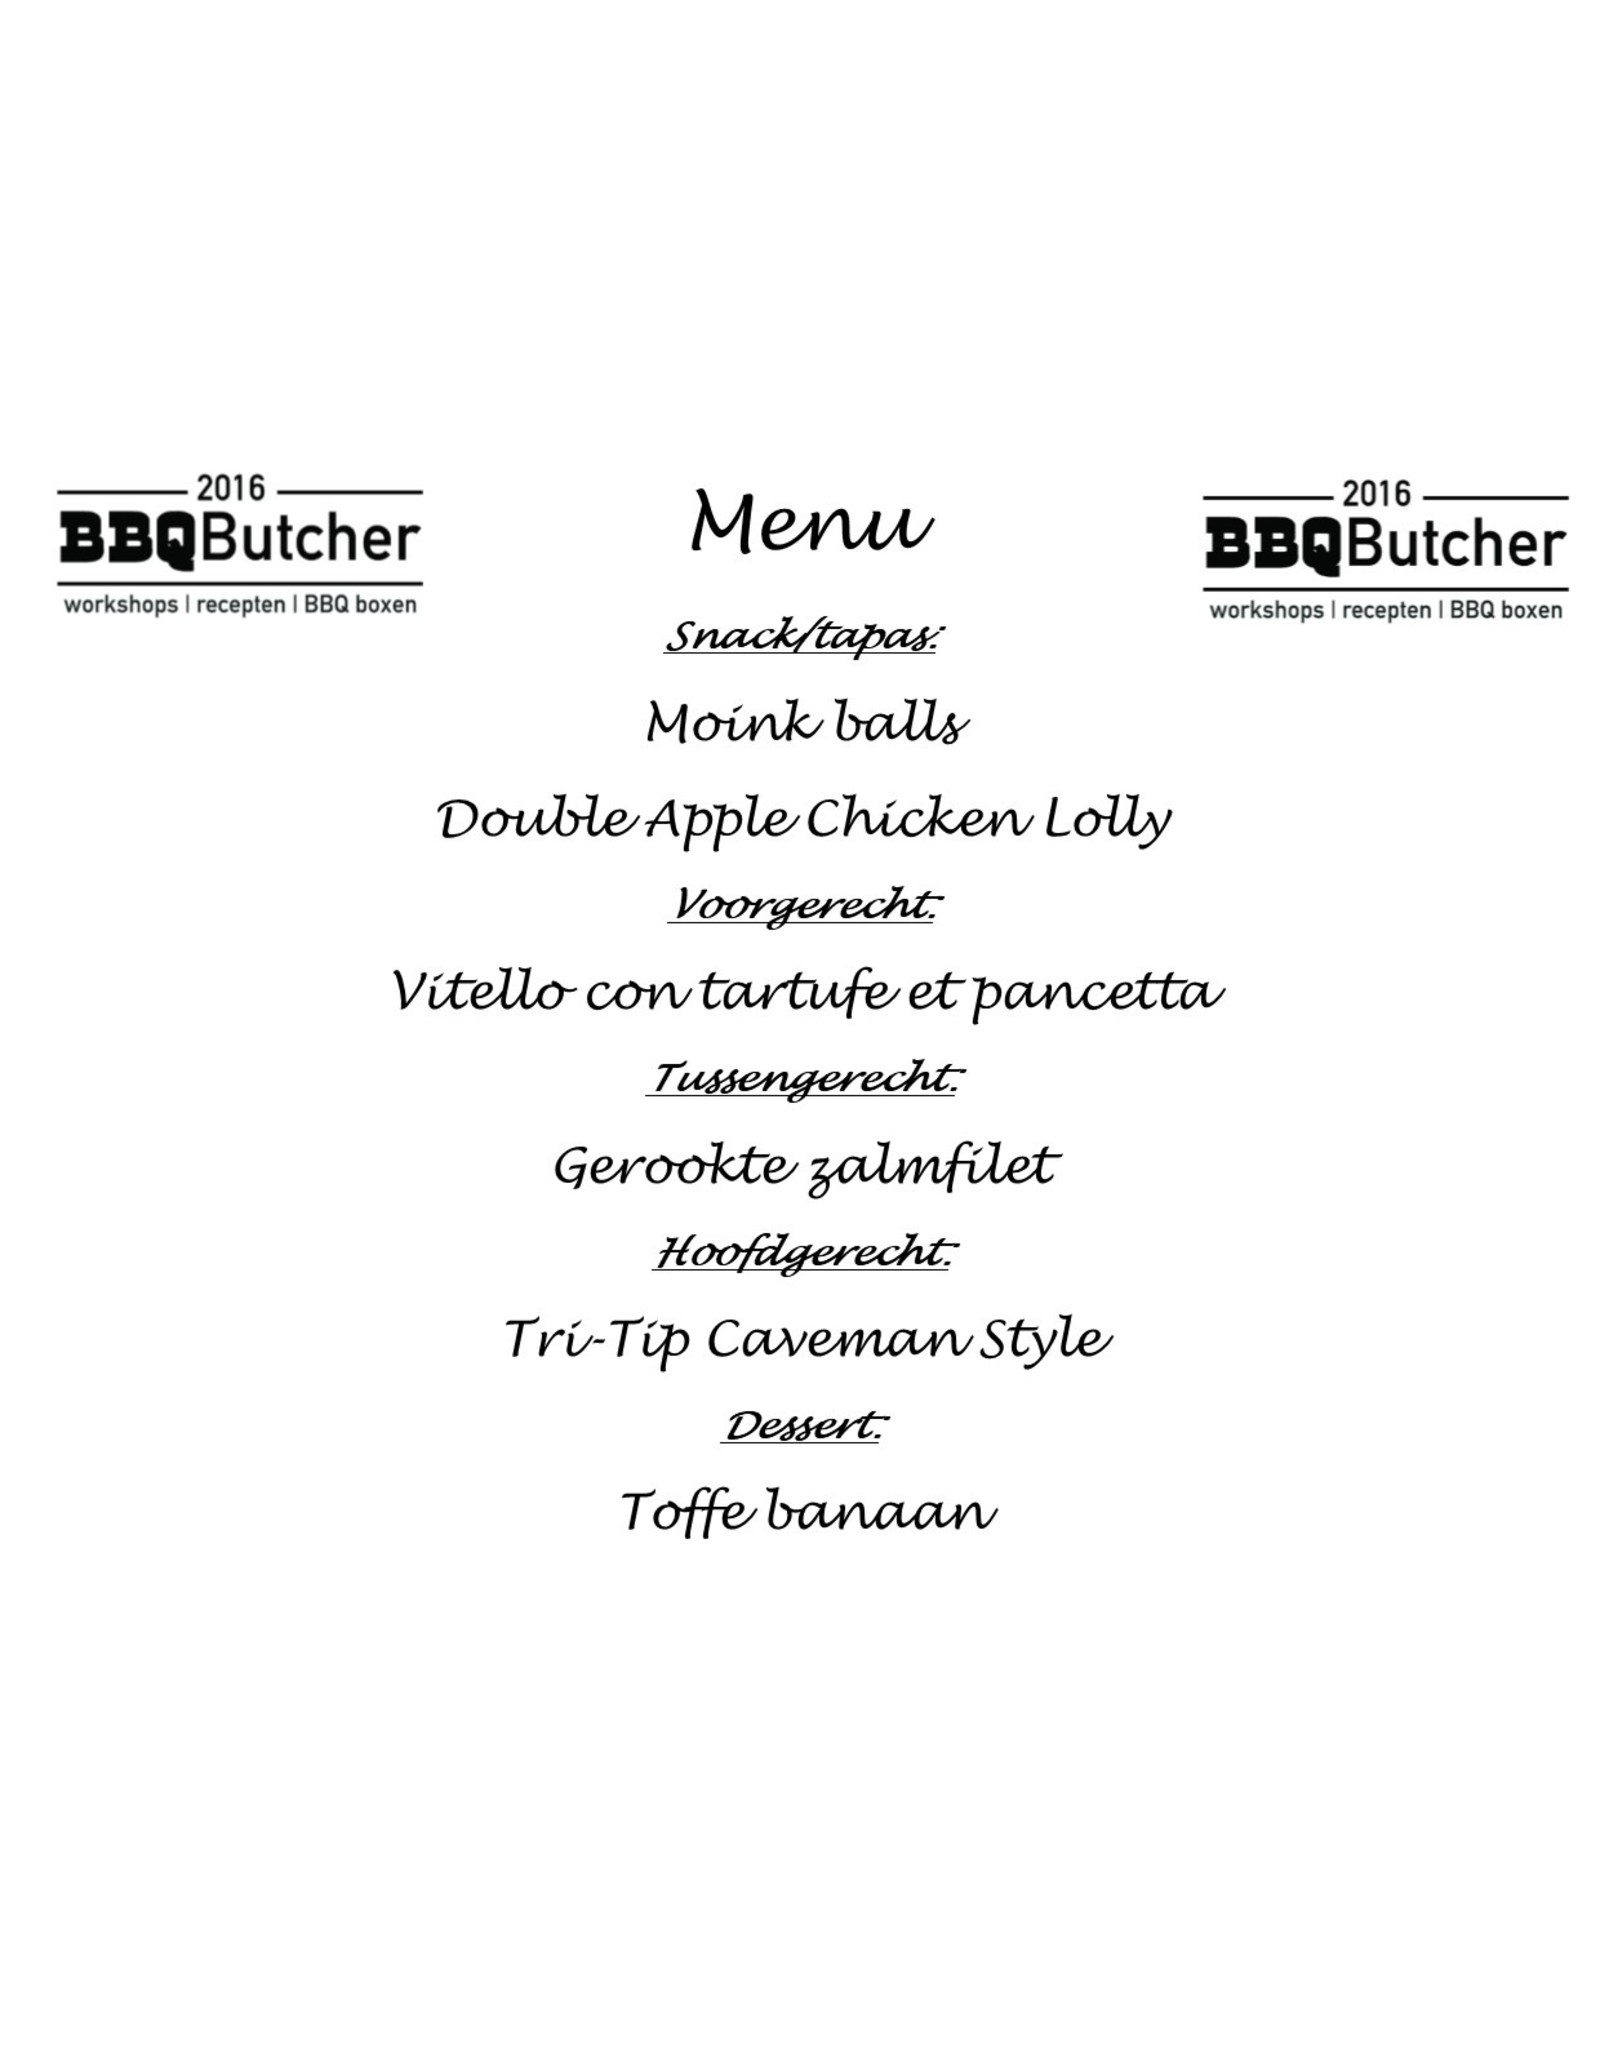 BBQ Butcher#1 Workshop